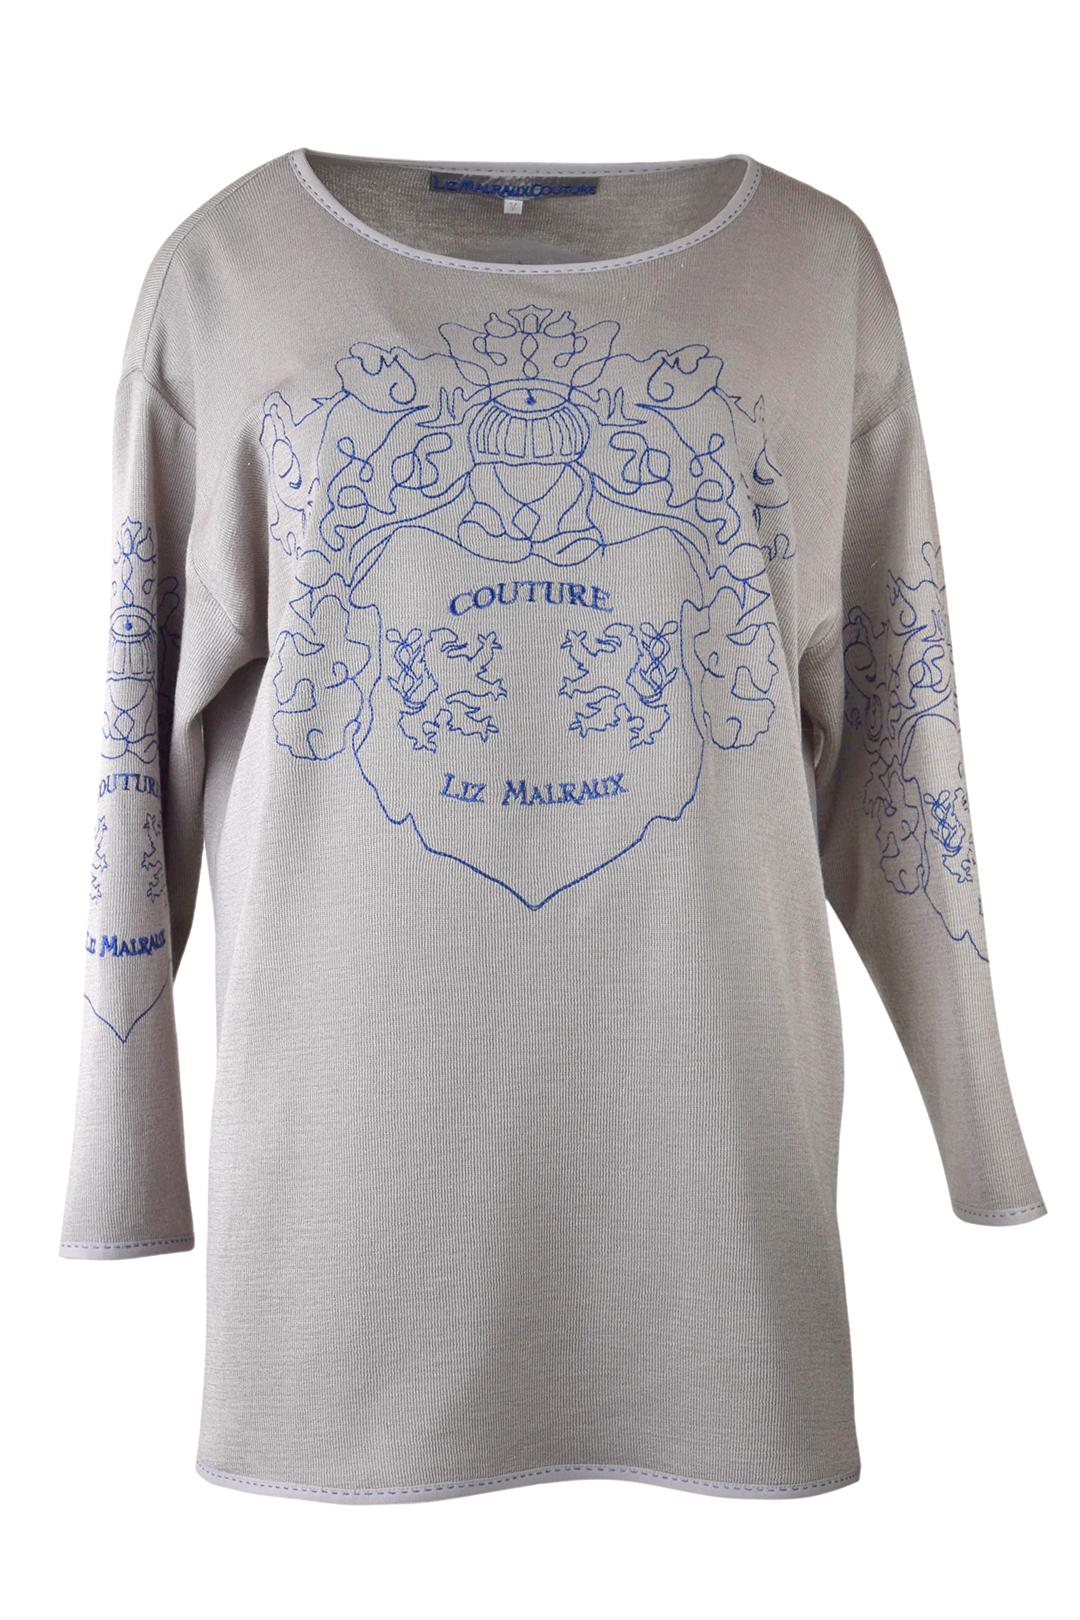 "Pulli mit ""shadow-heraldic embroidery"", 4 Motive, Baumwolle & Polyester"